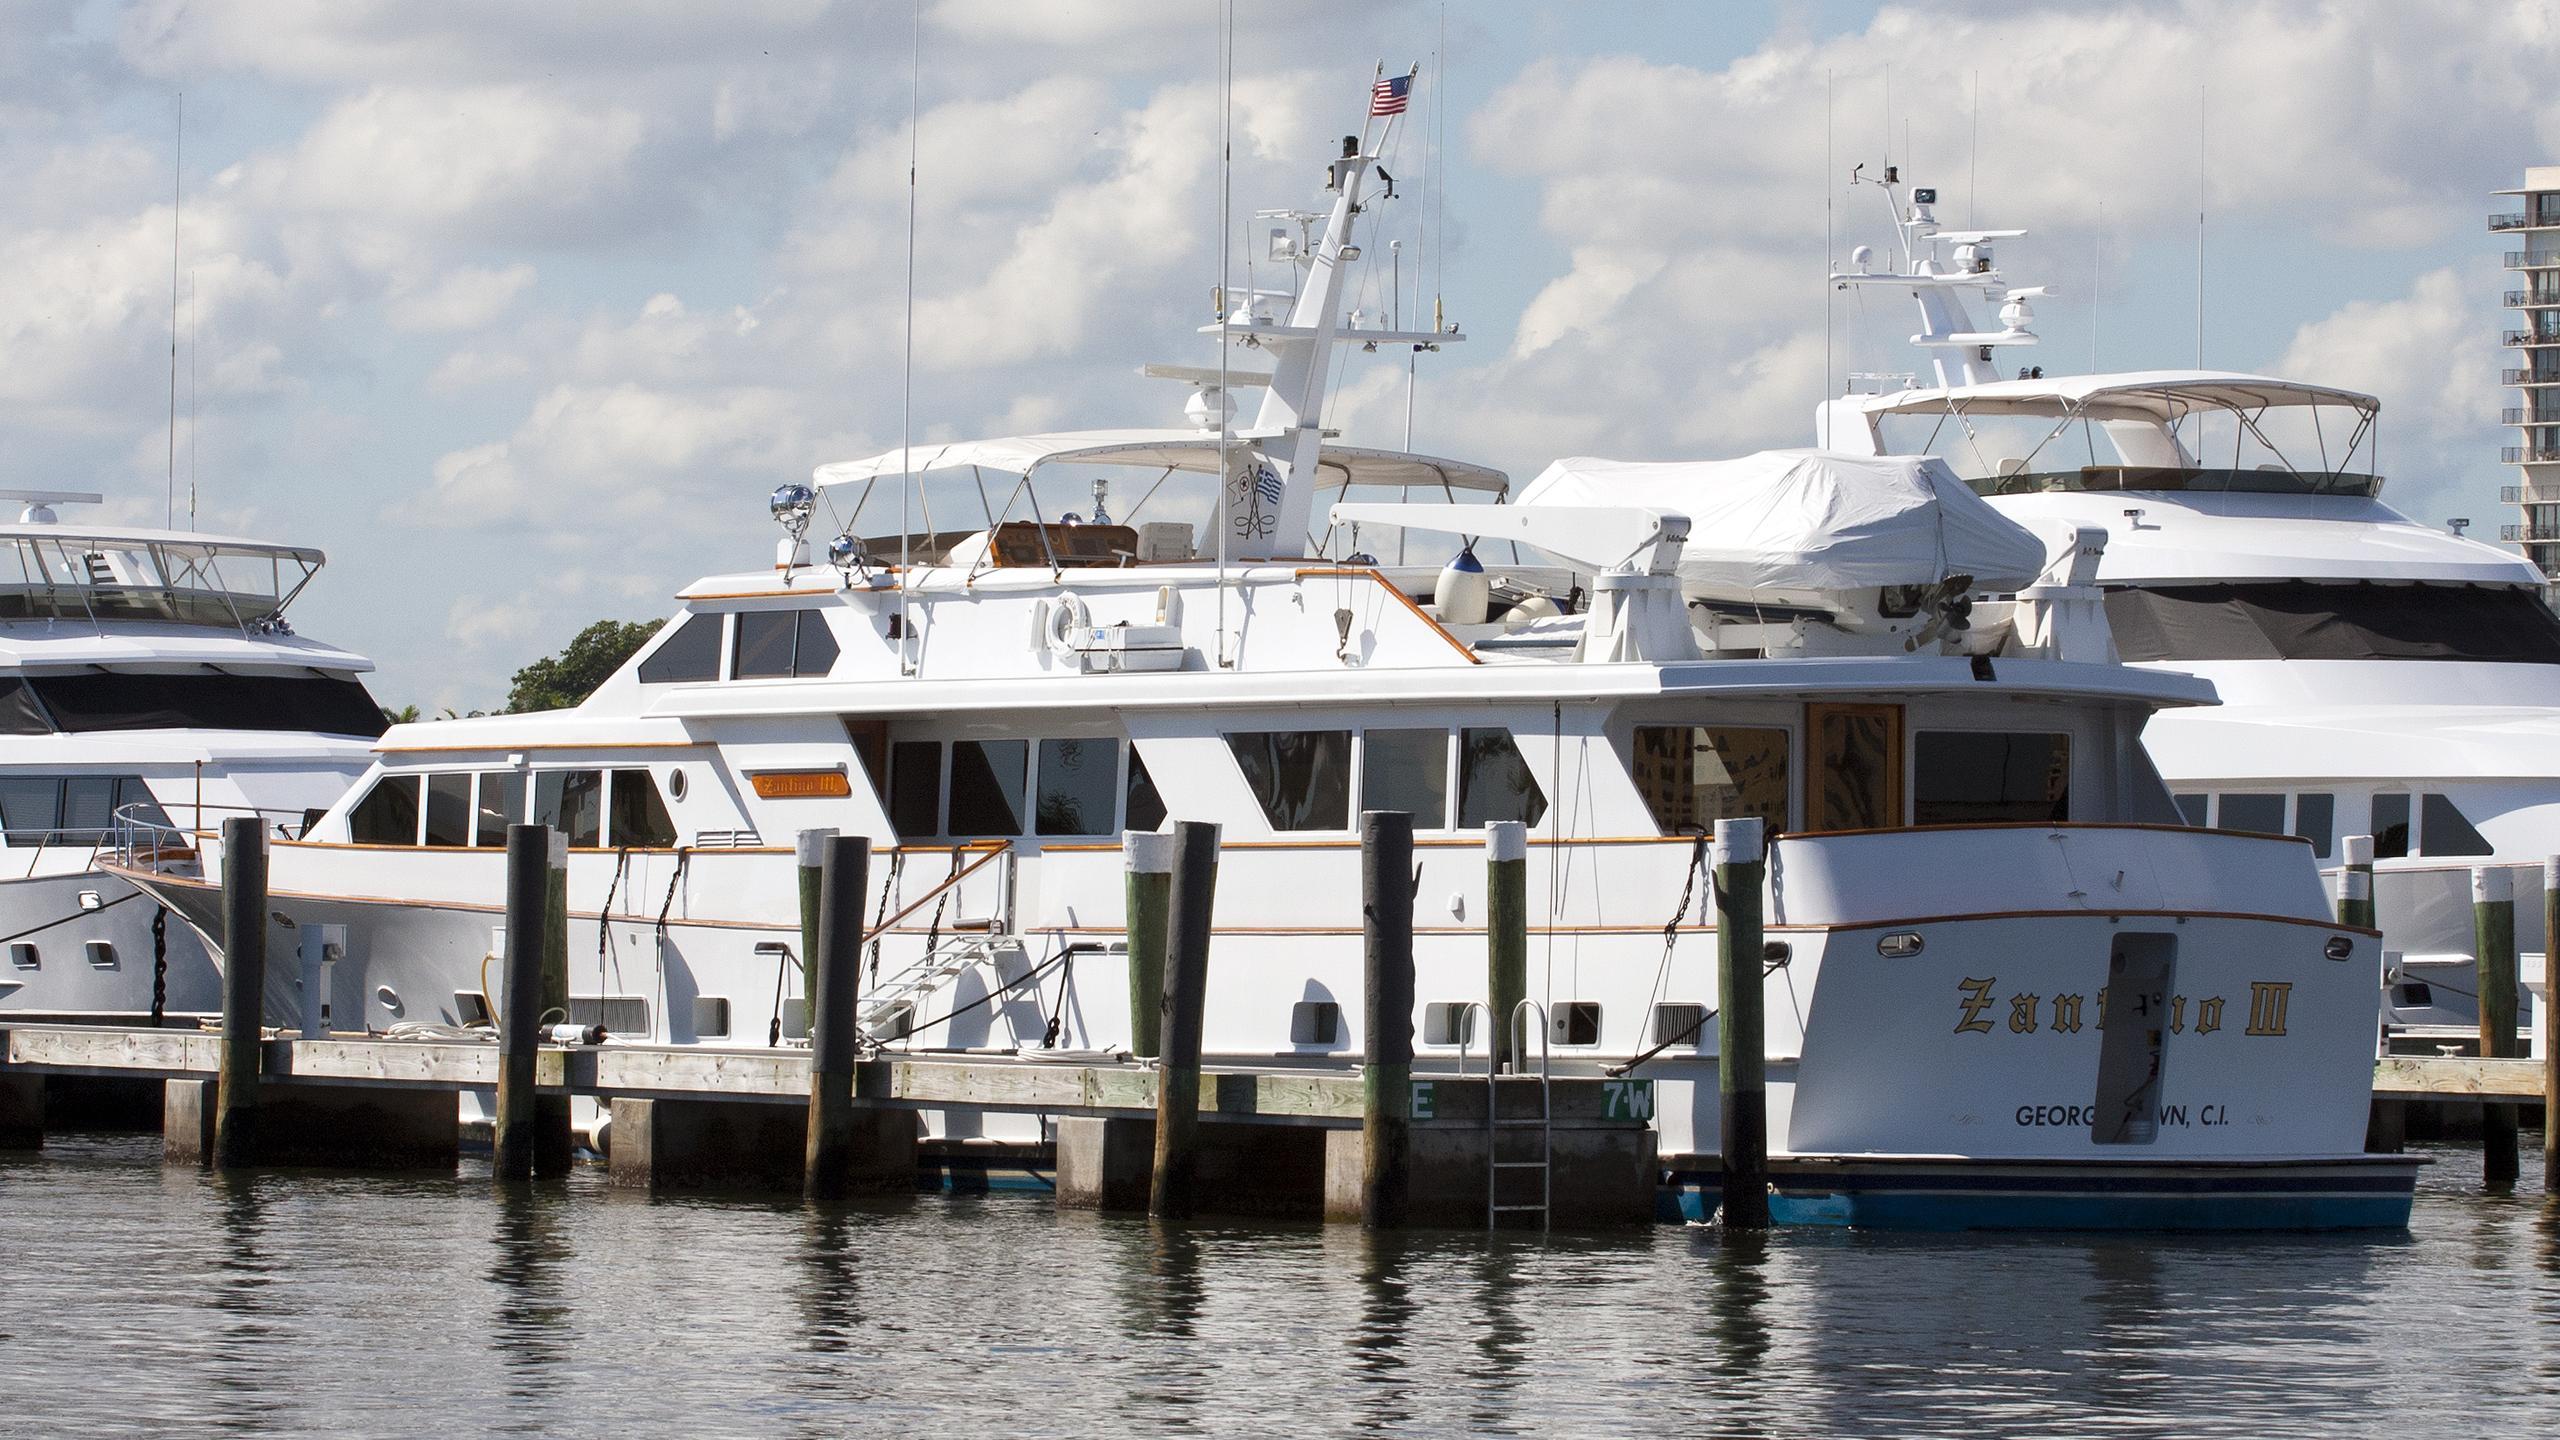 zantino-iii-motor-yacht-denison-1986-32m-half-profile